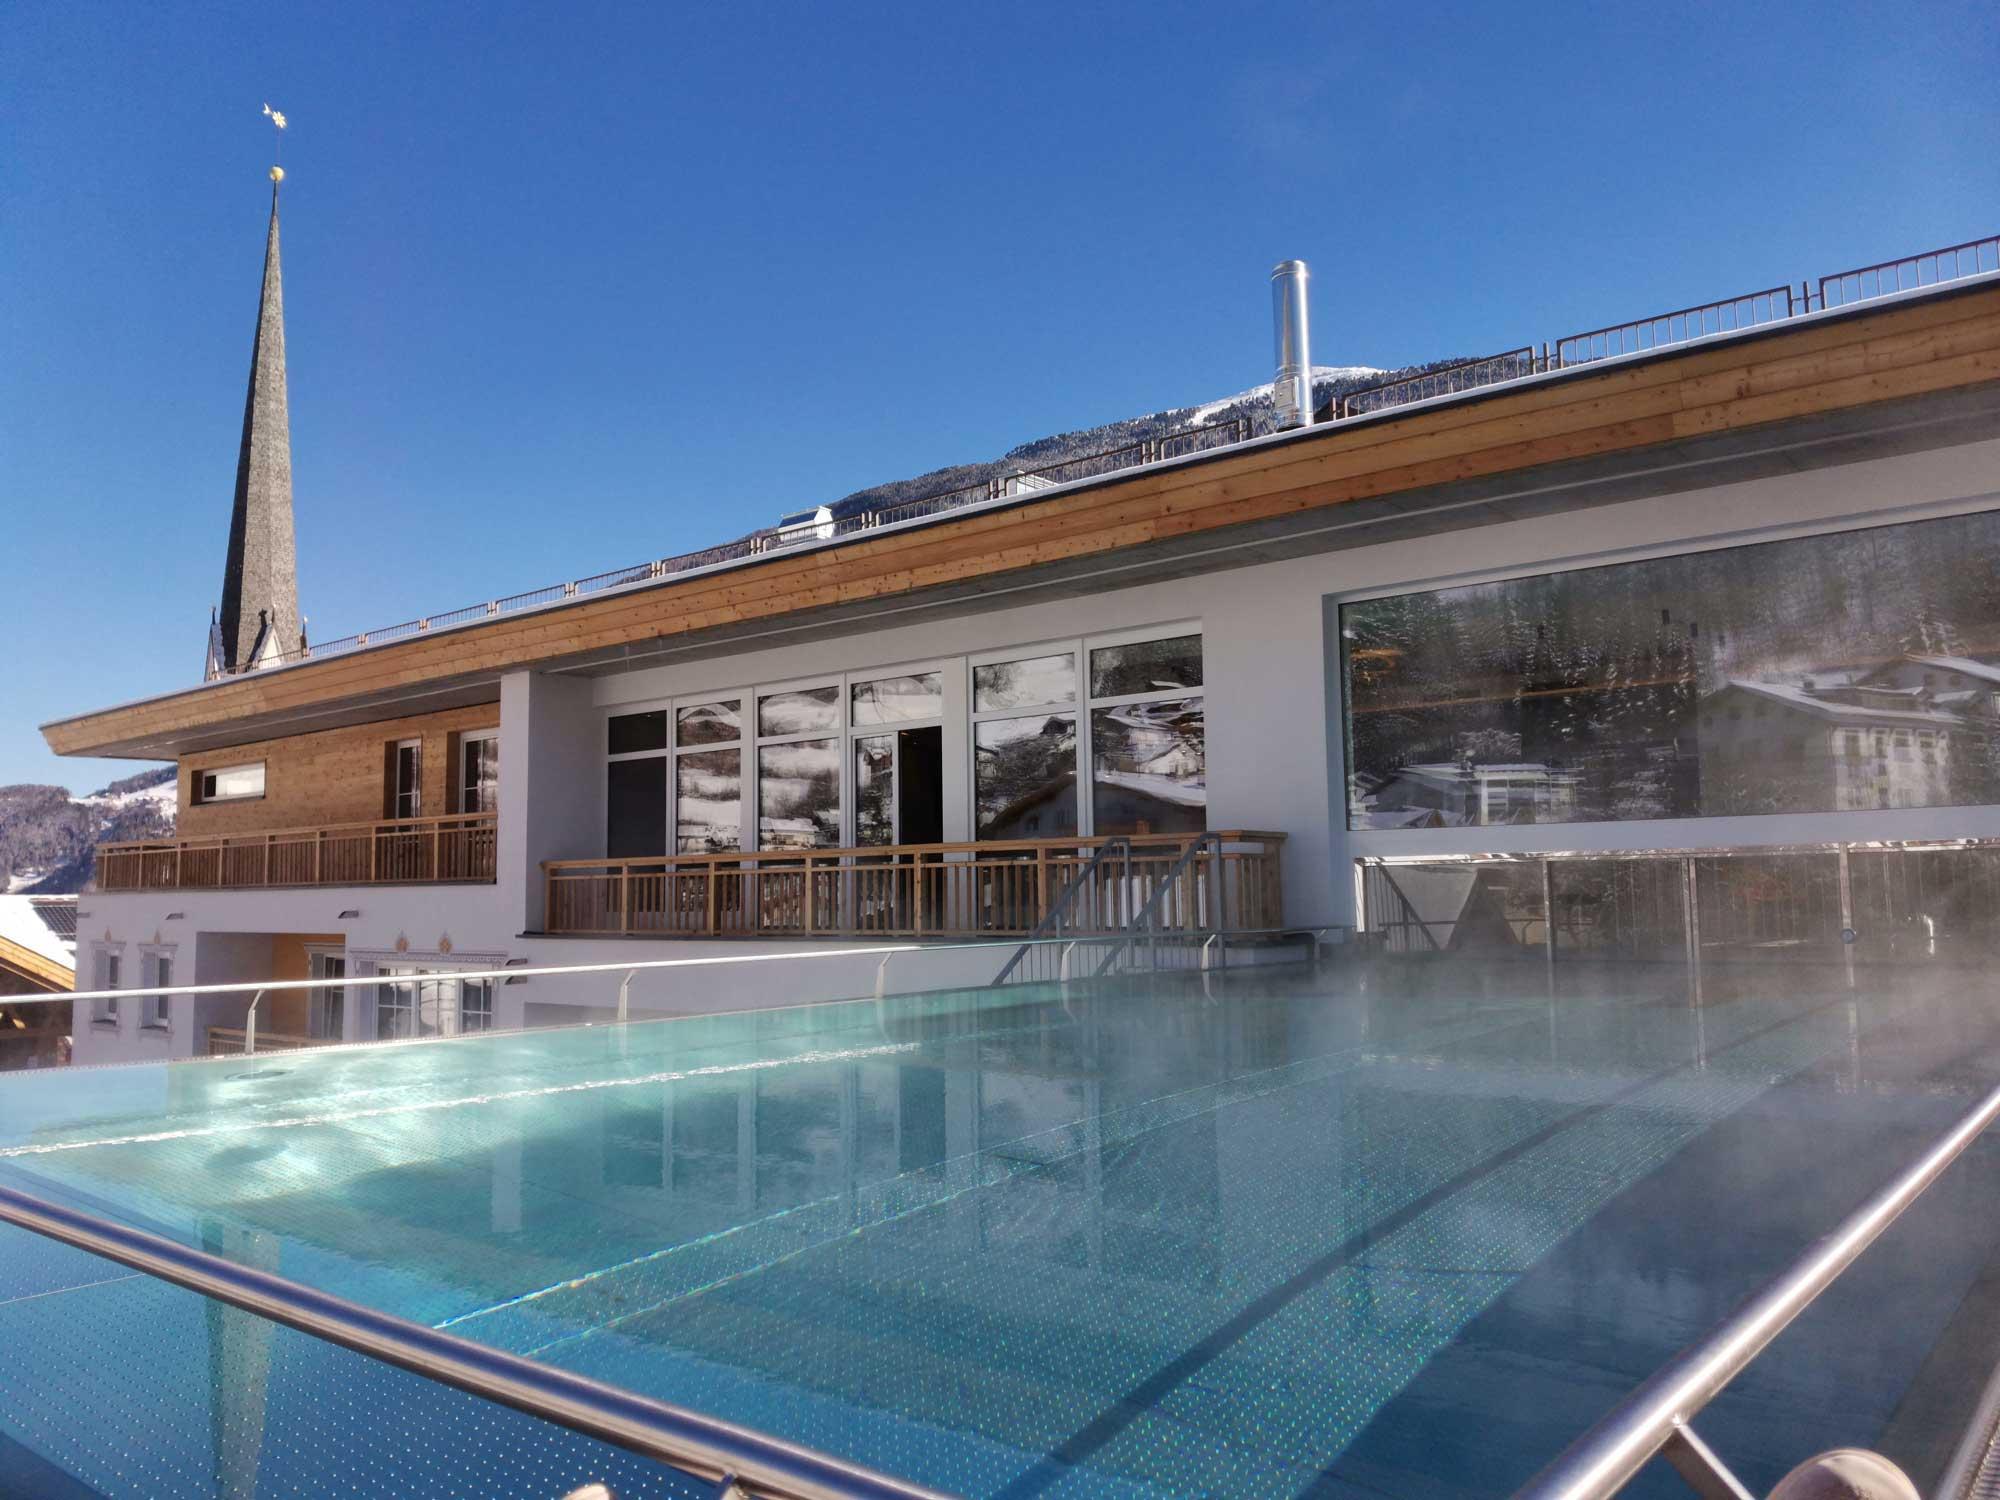 http://hotel-sailer.at/sites/default/files/pool_1.jpg